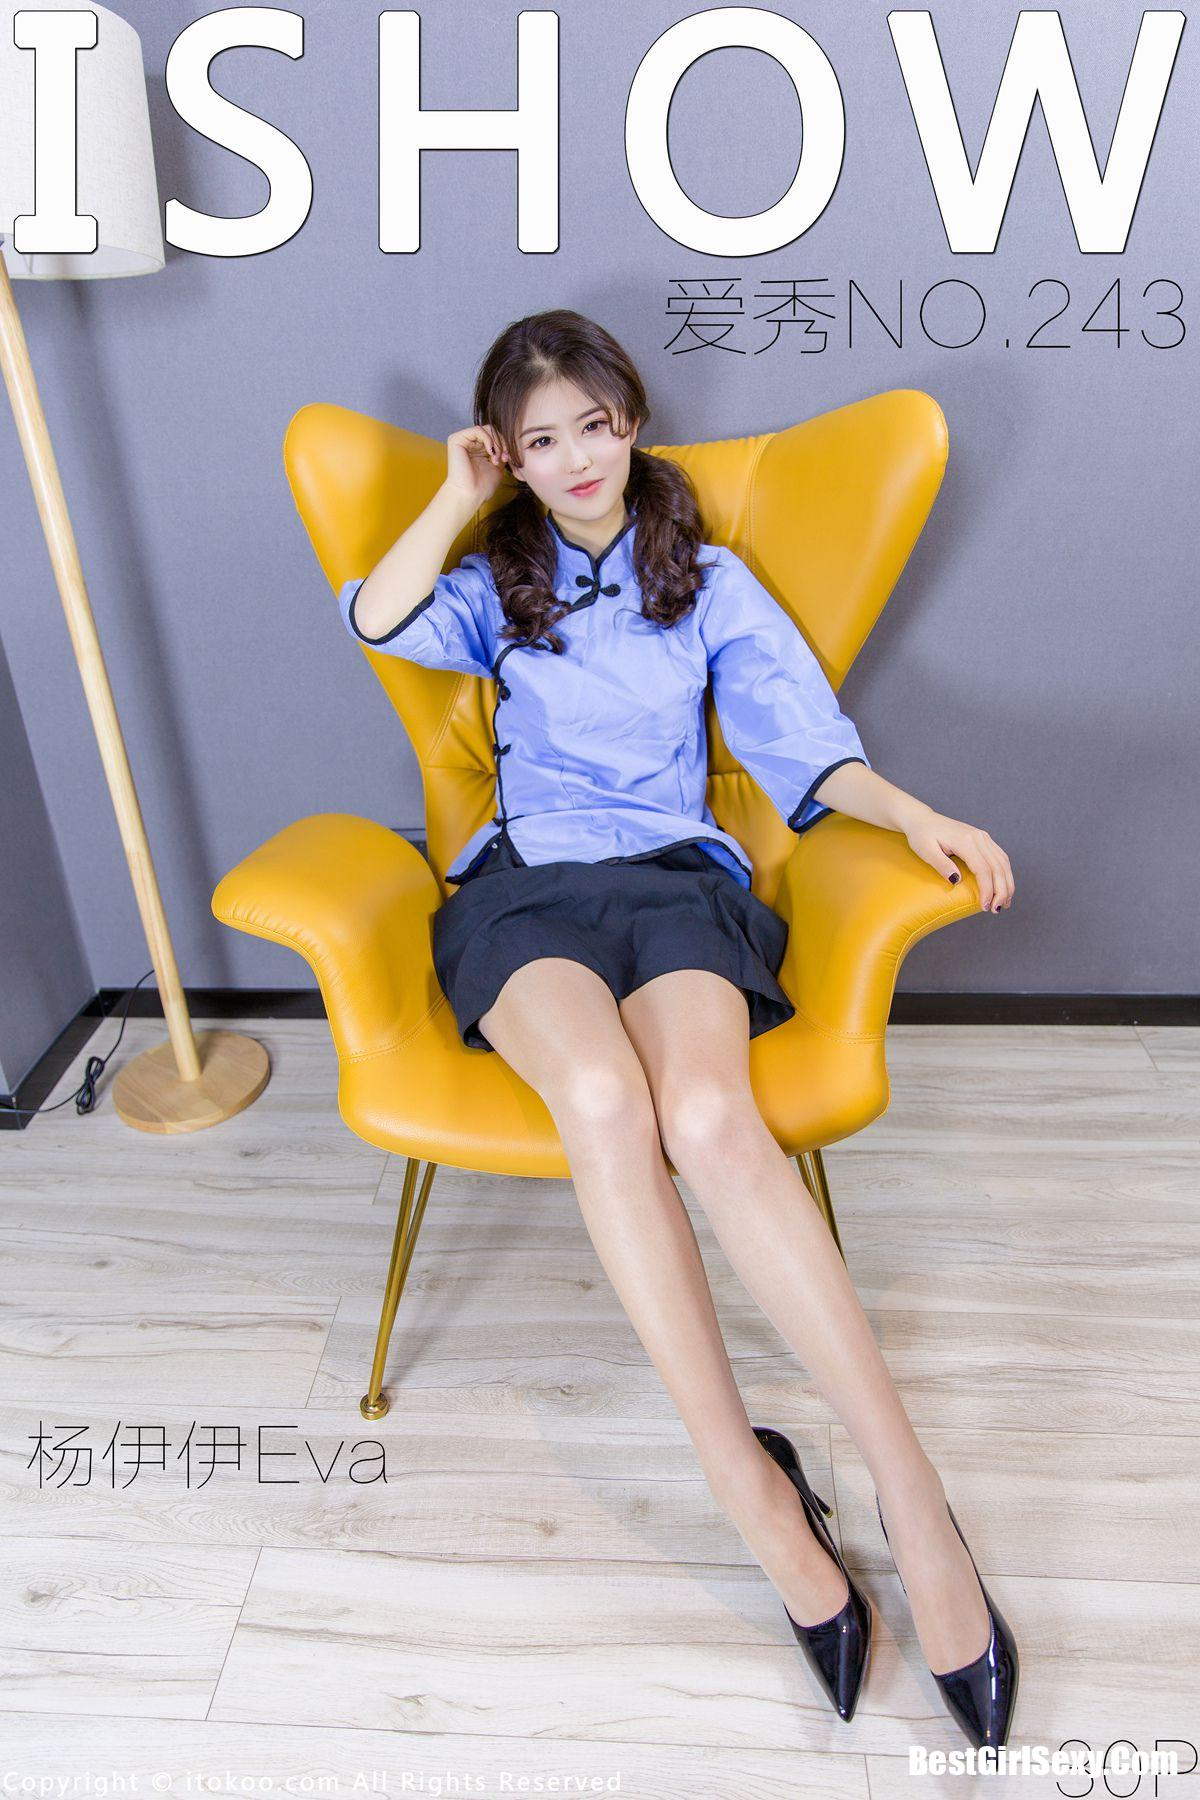 IShow爱秀 Vol.243 杨伊伊Eva